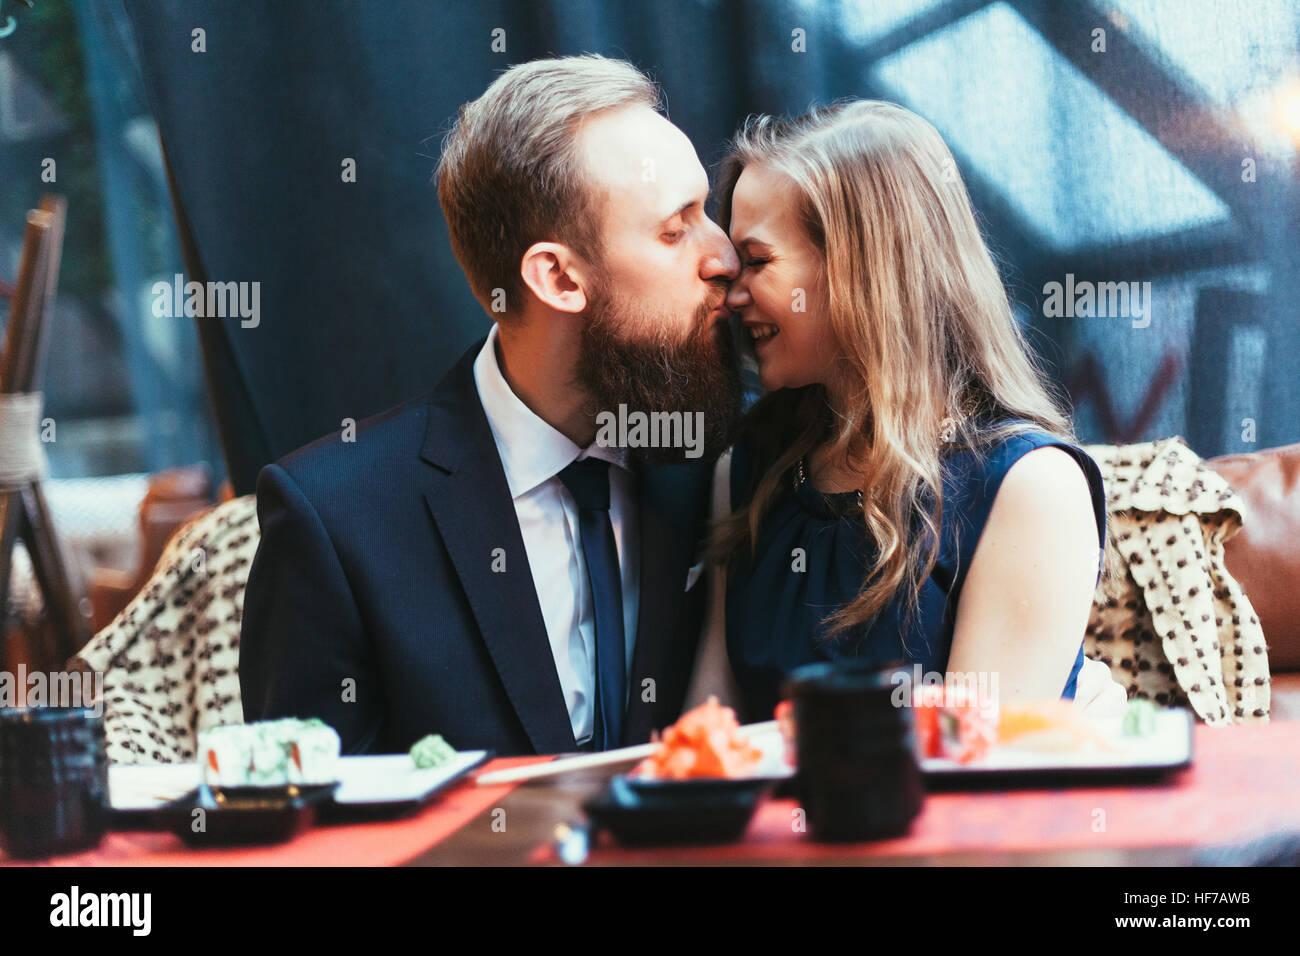 Pareja amorosa en un restaurante Imagen De Stock